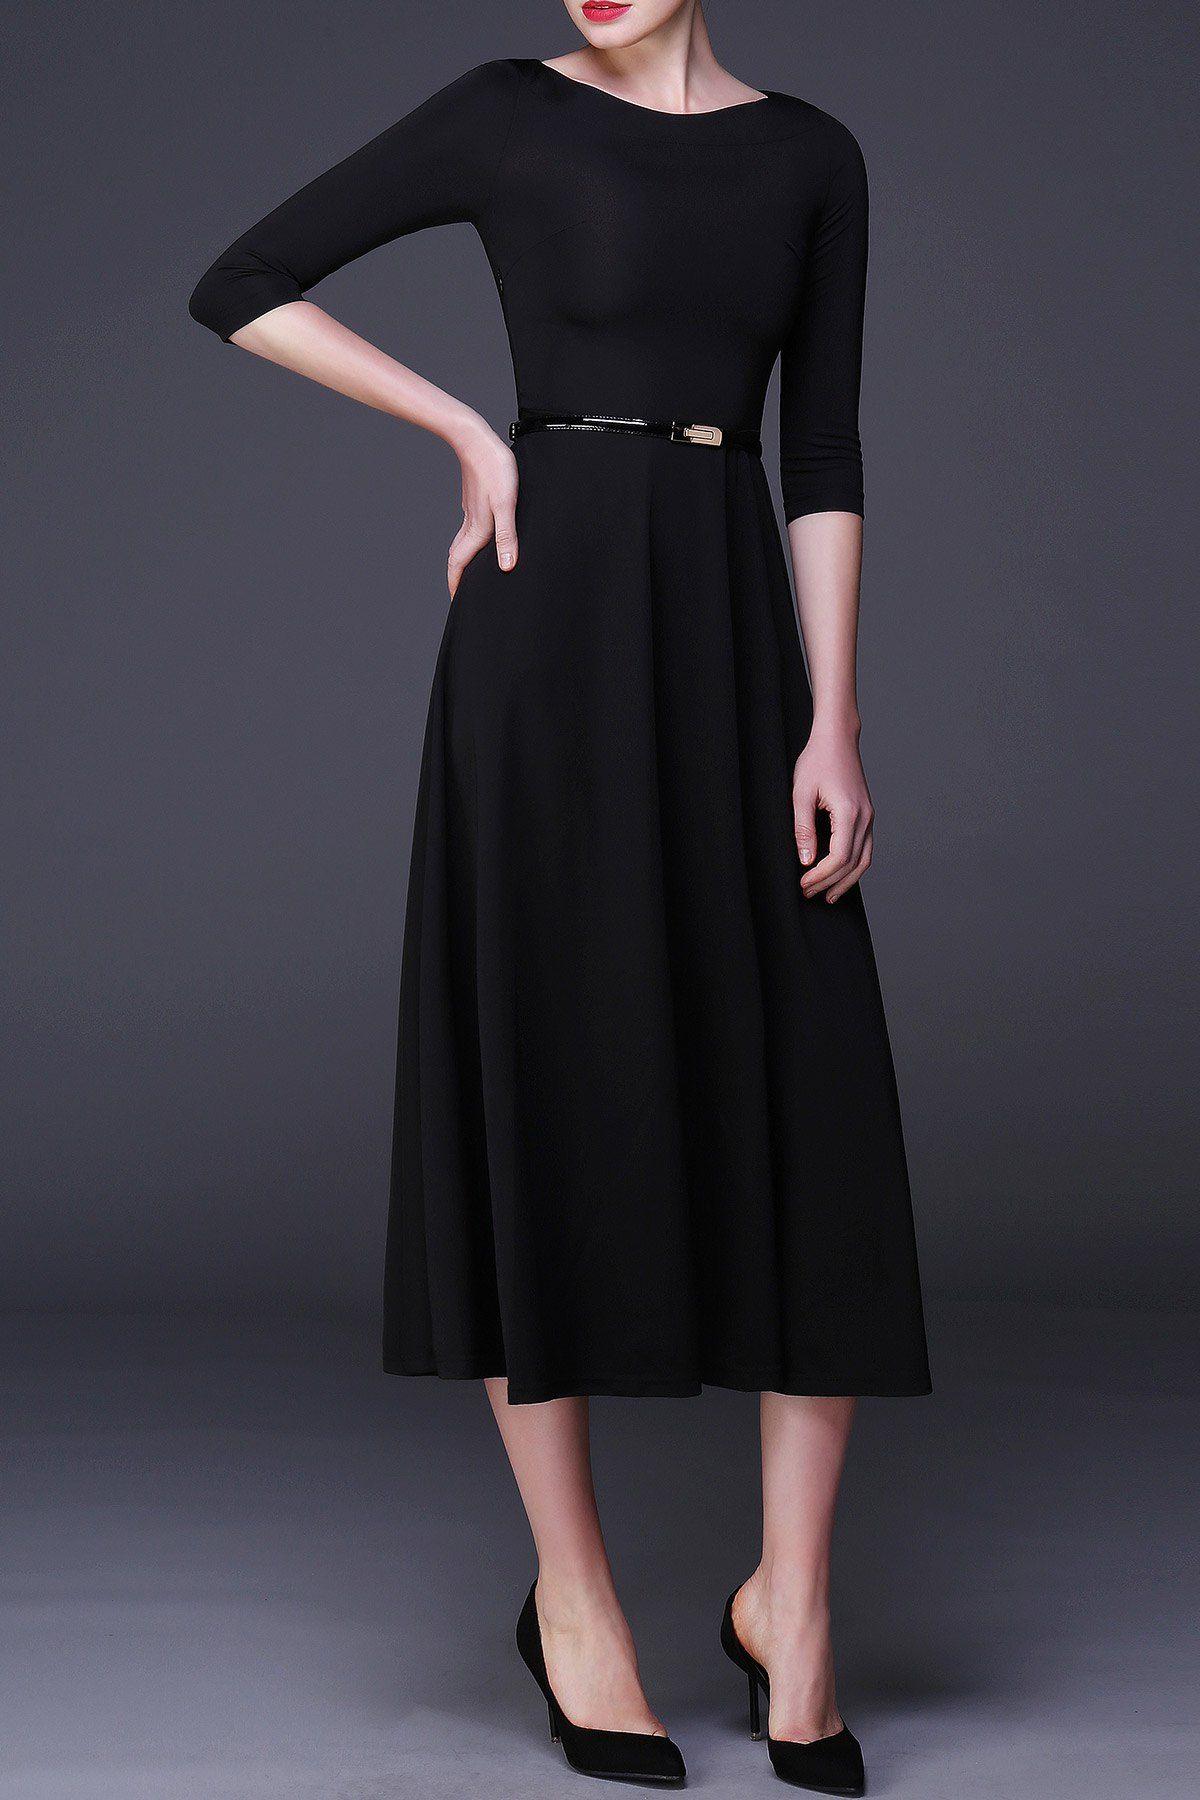 36++ Black three quarter sleeve dress info